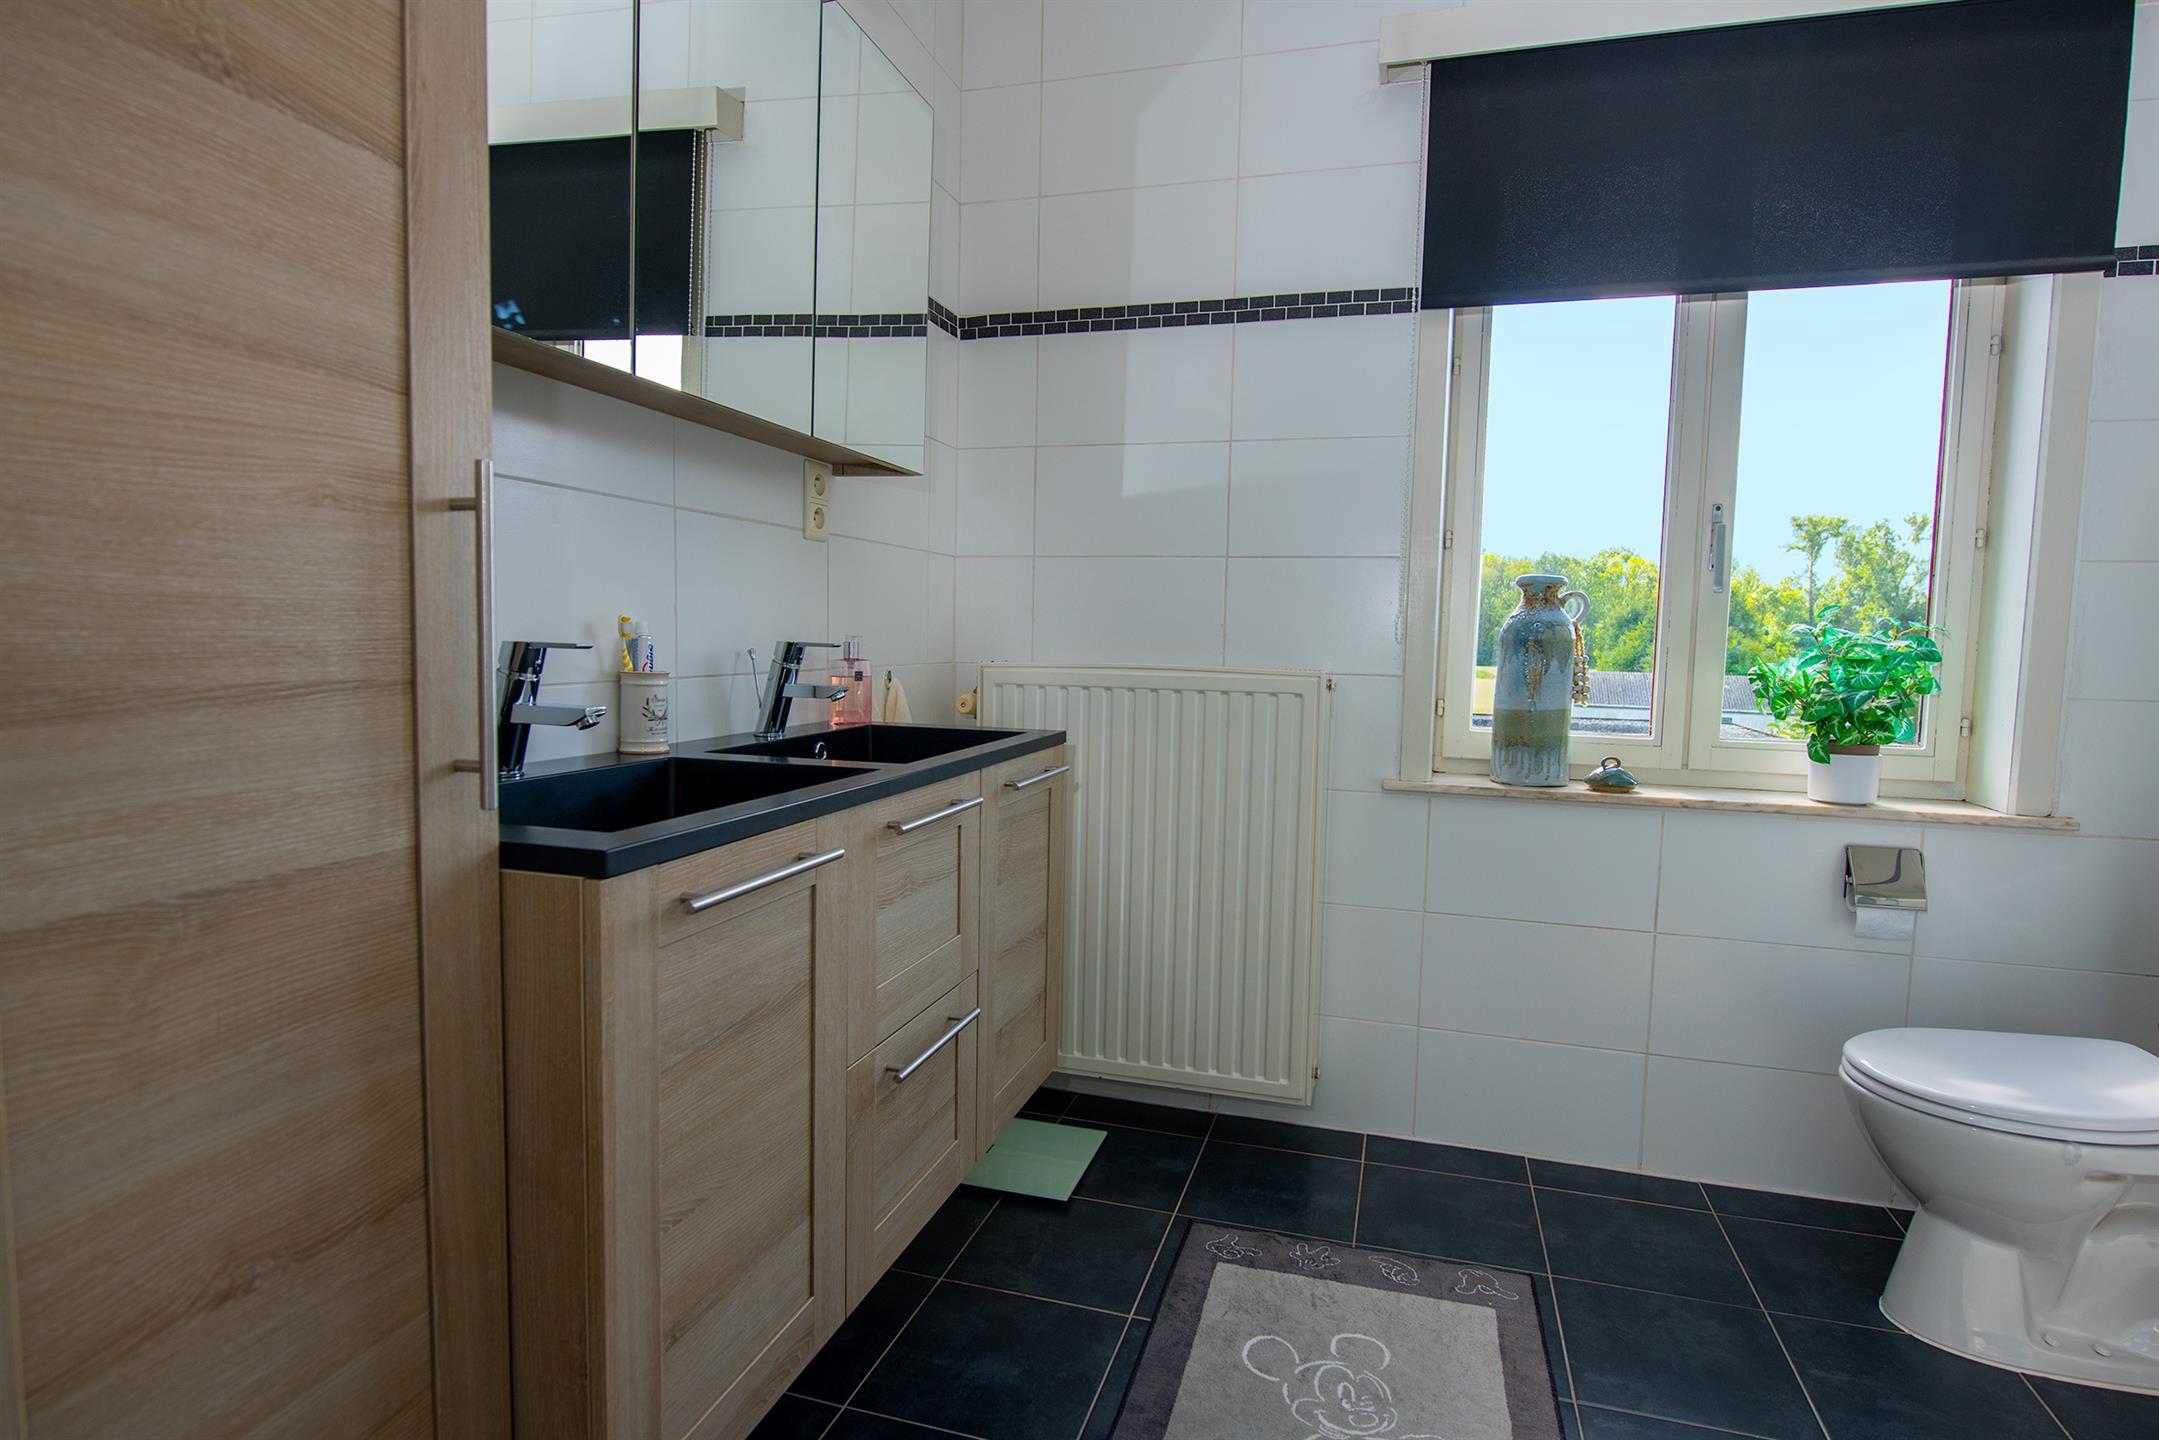 Charmant huis - Sint-Katelijne-Waver - #4492892-11